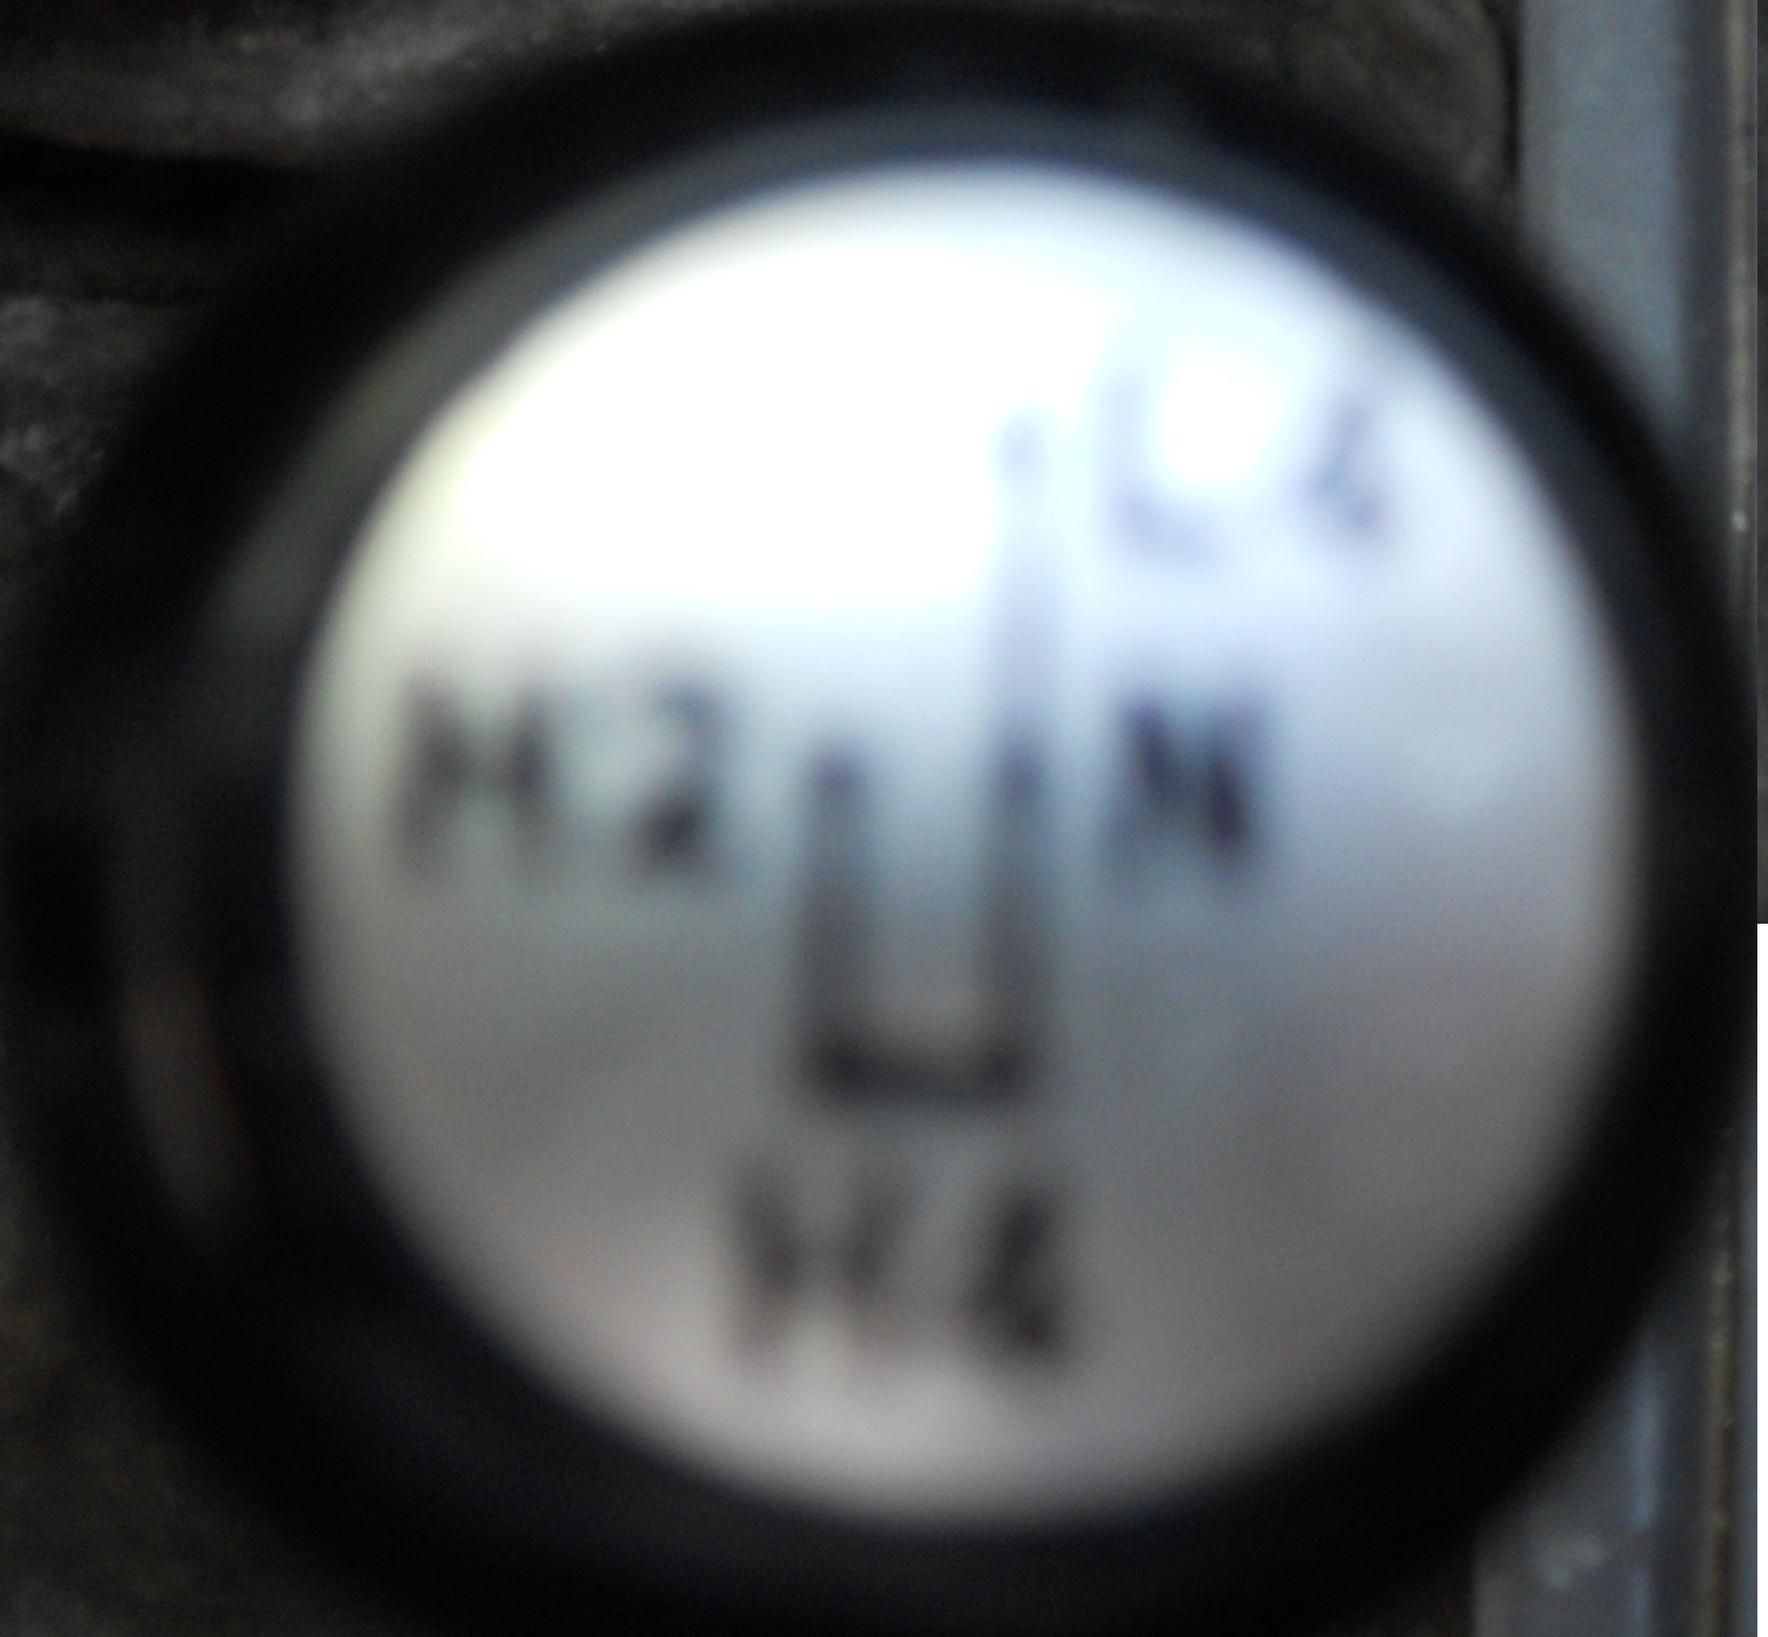 Toyota 4x4 Shift Diagram Trusted Schematics Engaging On 1989 4runner 2 Door 5 Speed 05 F150 Vacuum